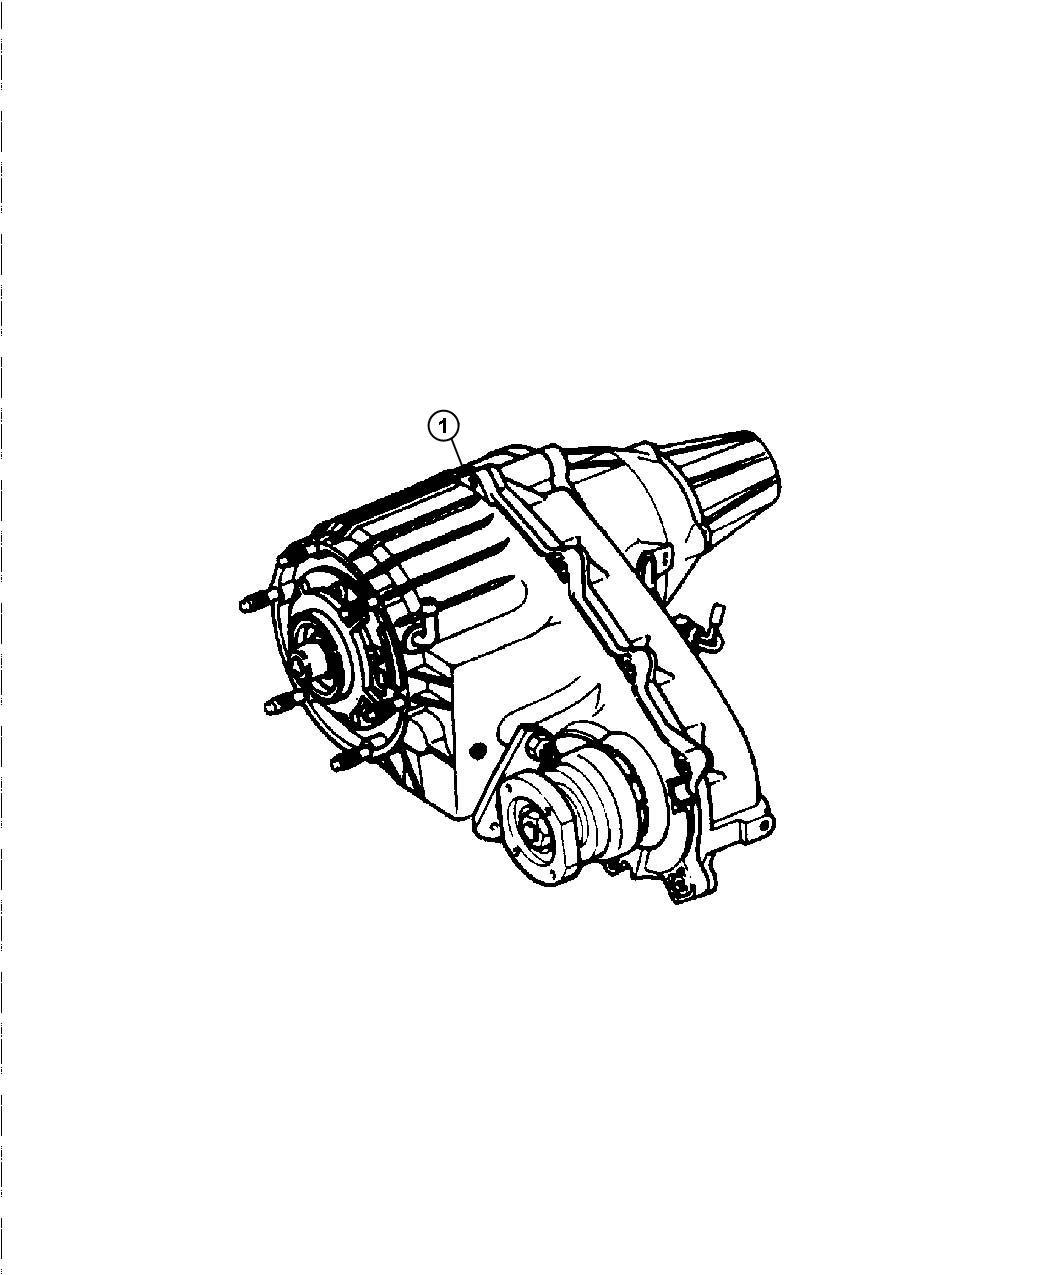 2003 Dodge Ram 1500 SLT REG CAB 4x4, 5.7L SMPI V8, 5-Spd